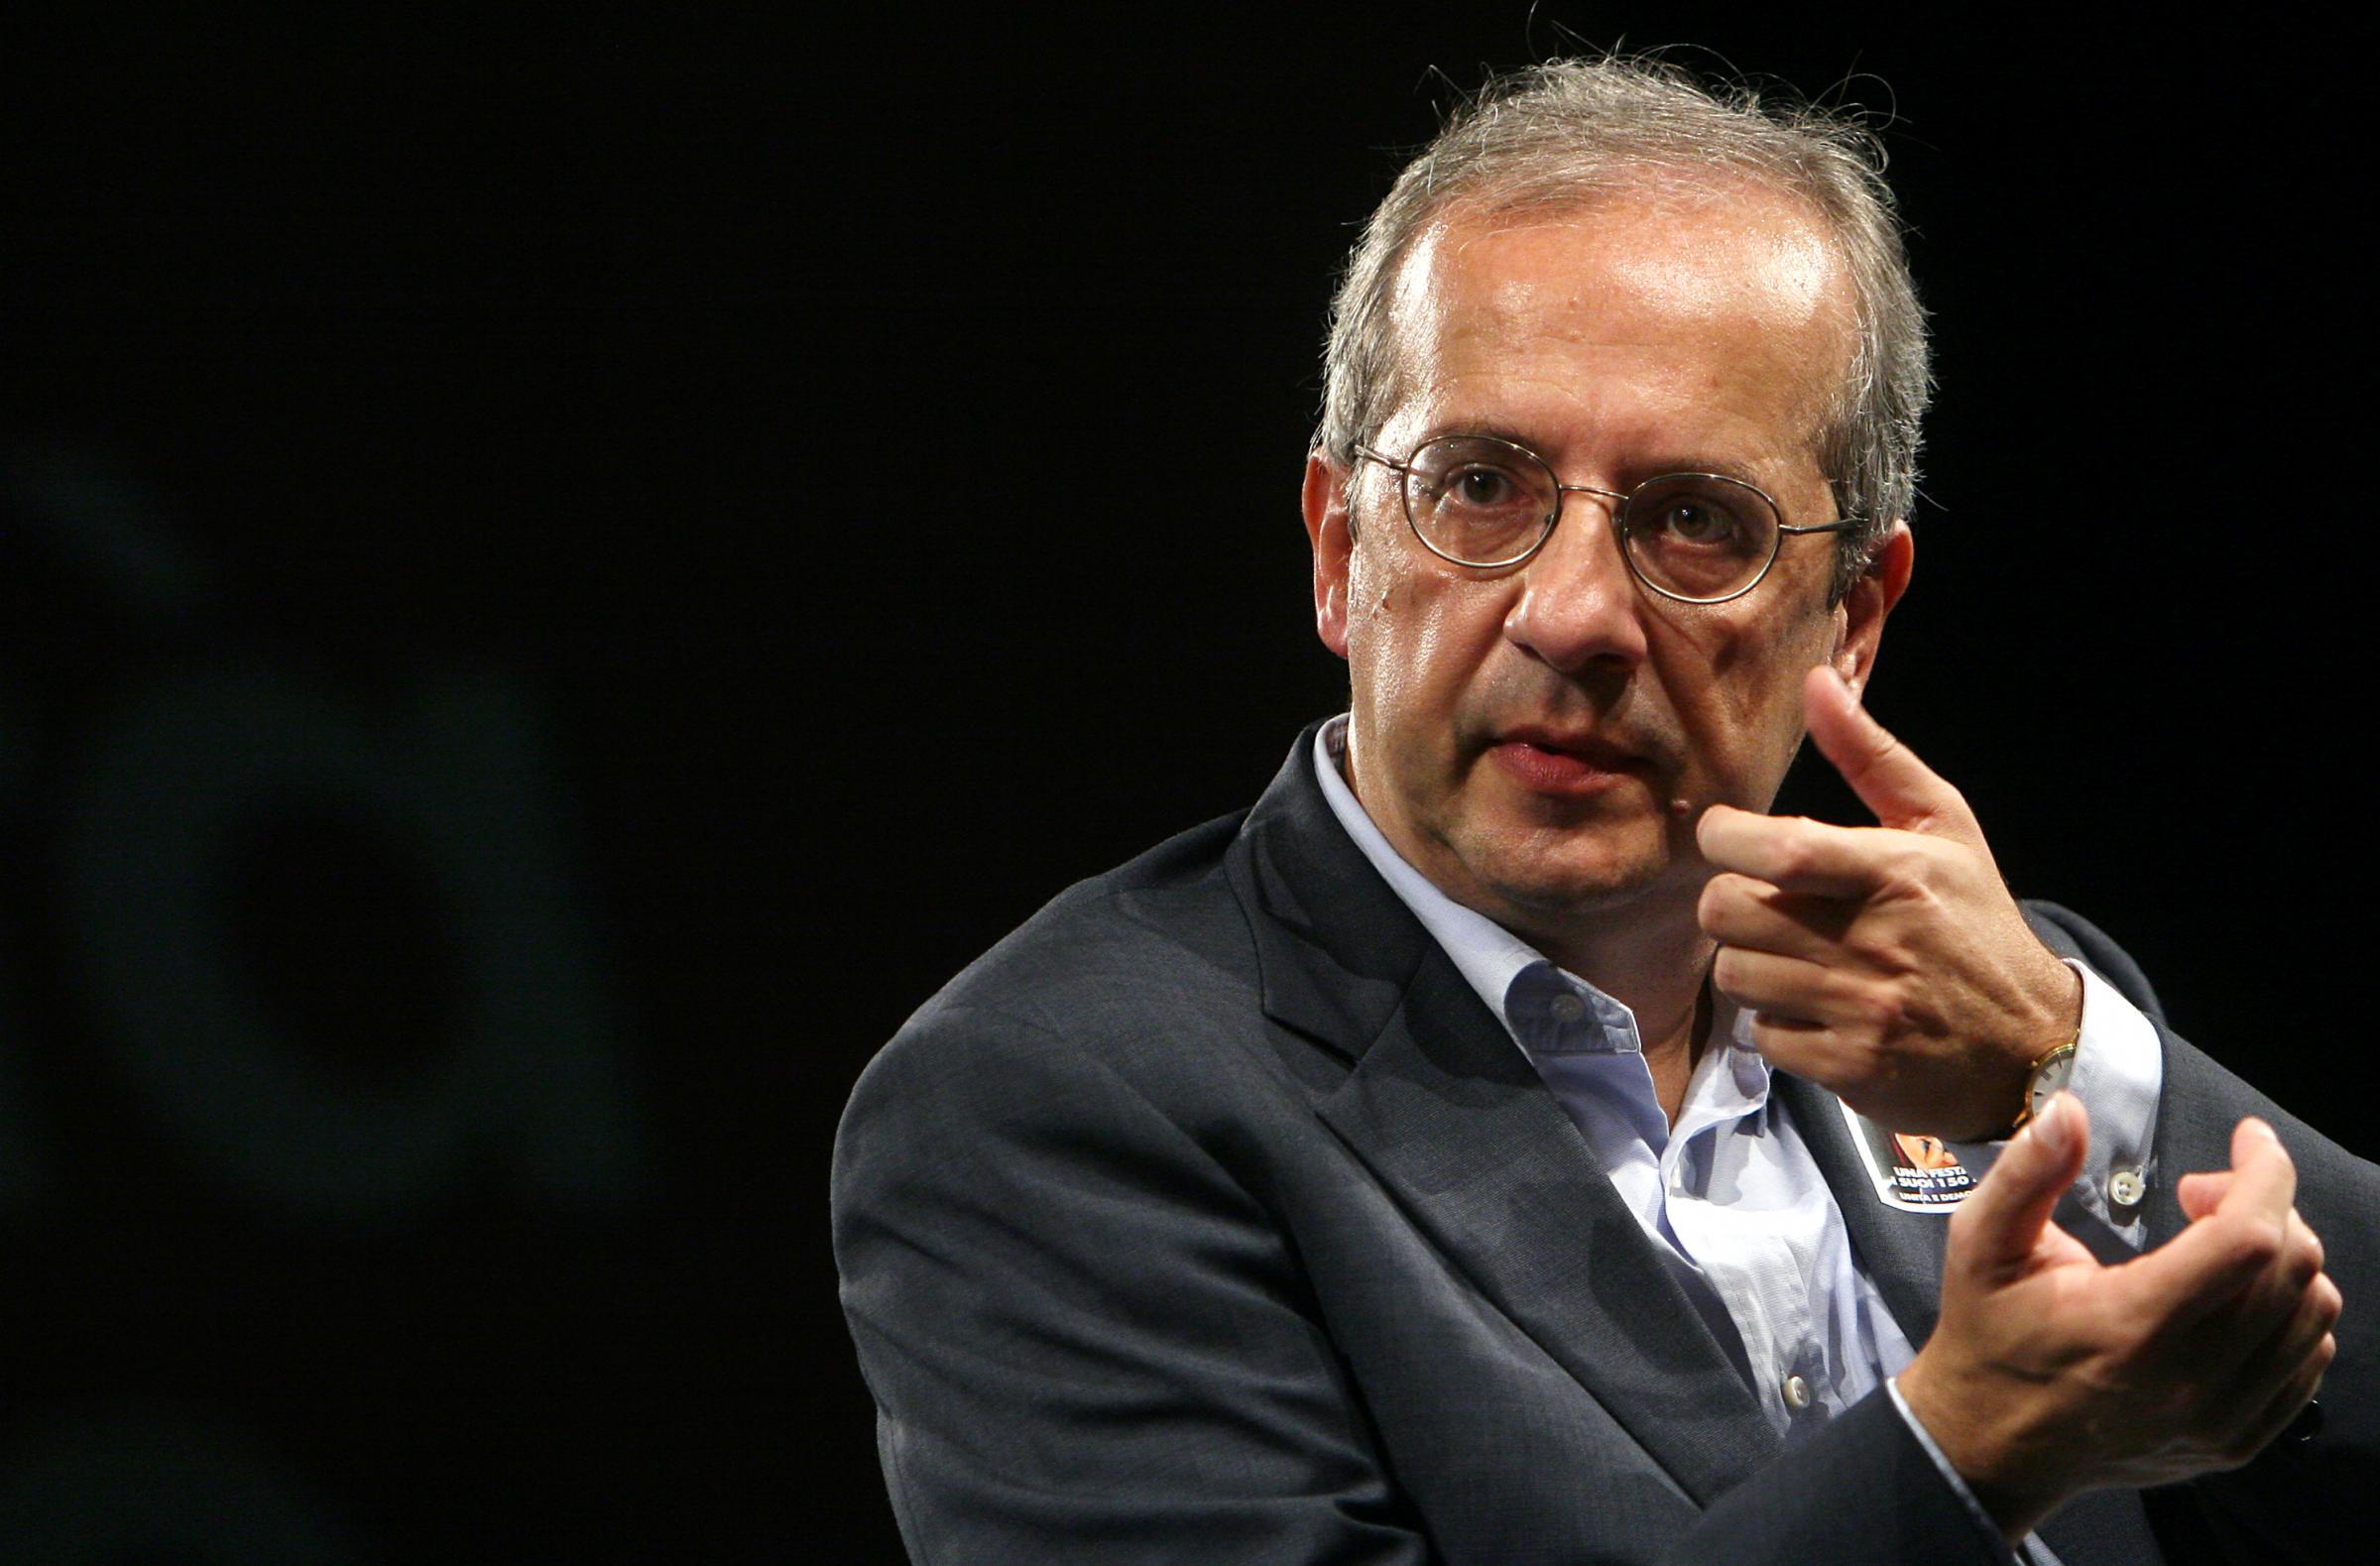 Presidenza Lega Calcio, Veltroni: